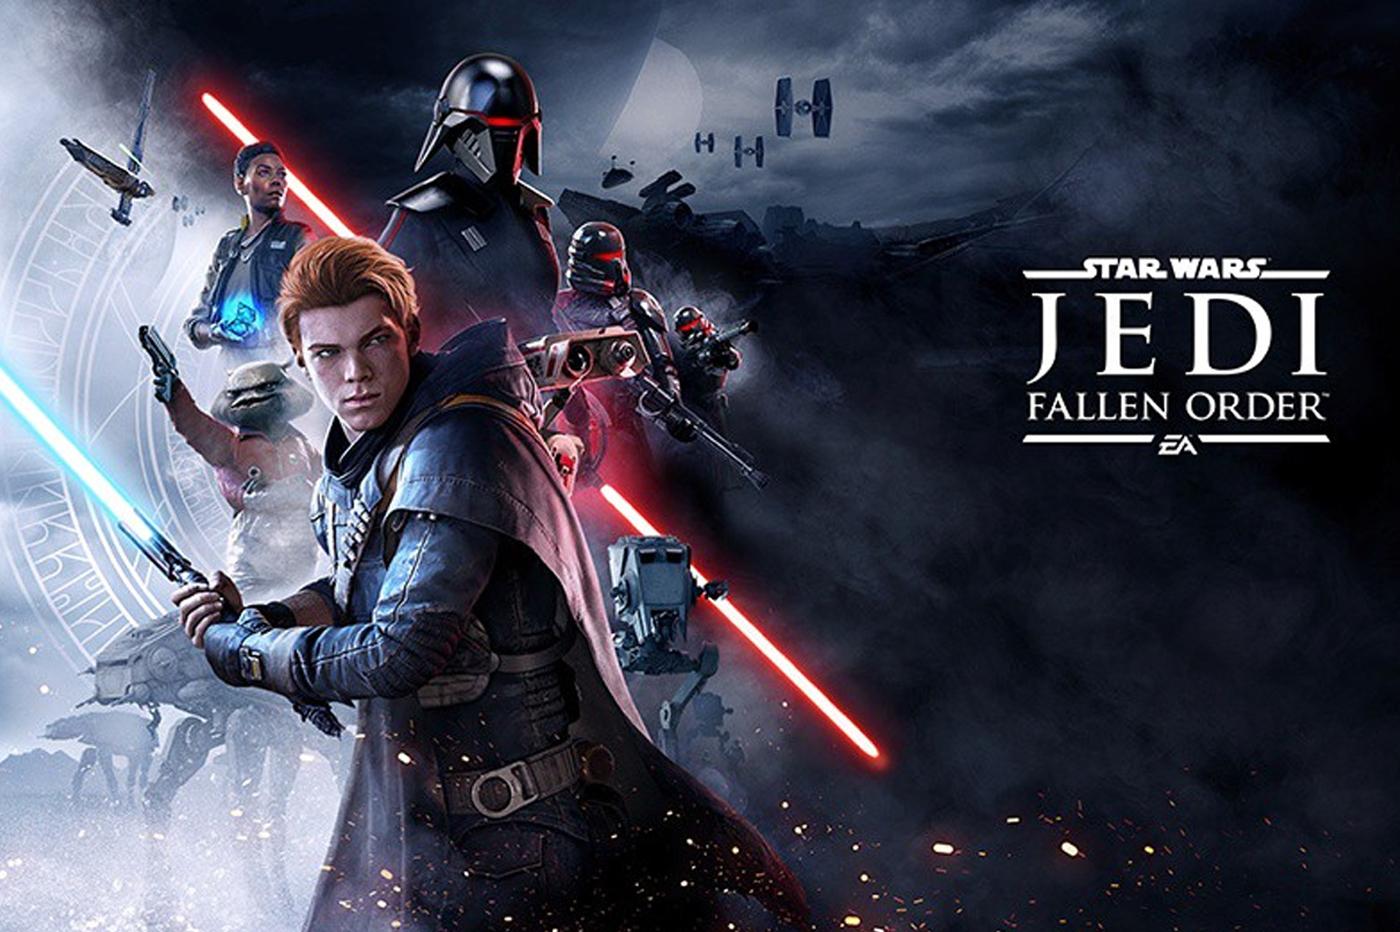 Avant-Première Star Wars Jedi Fallen Order E3 2019